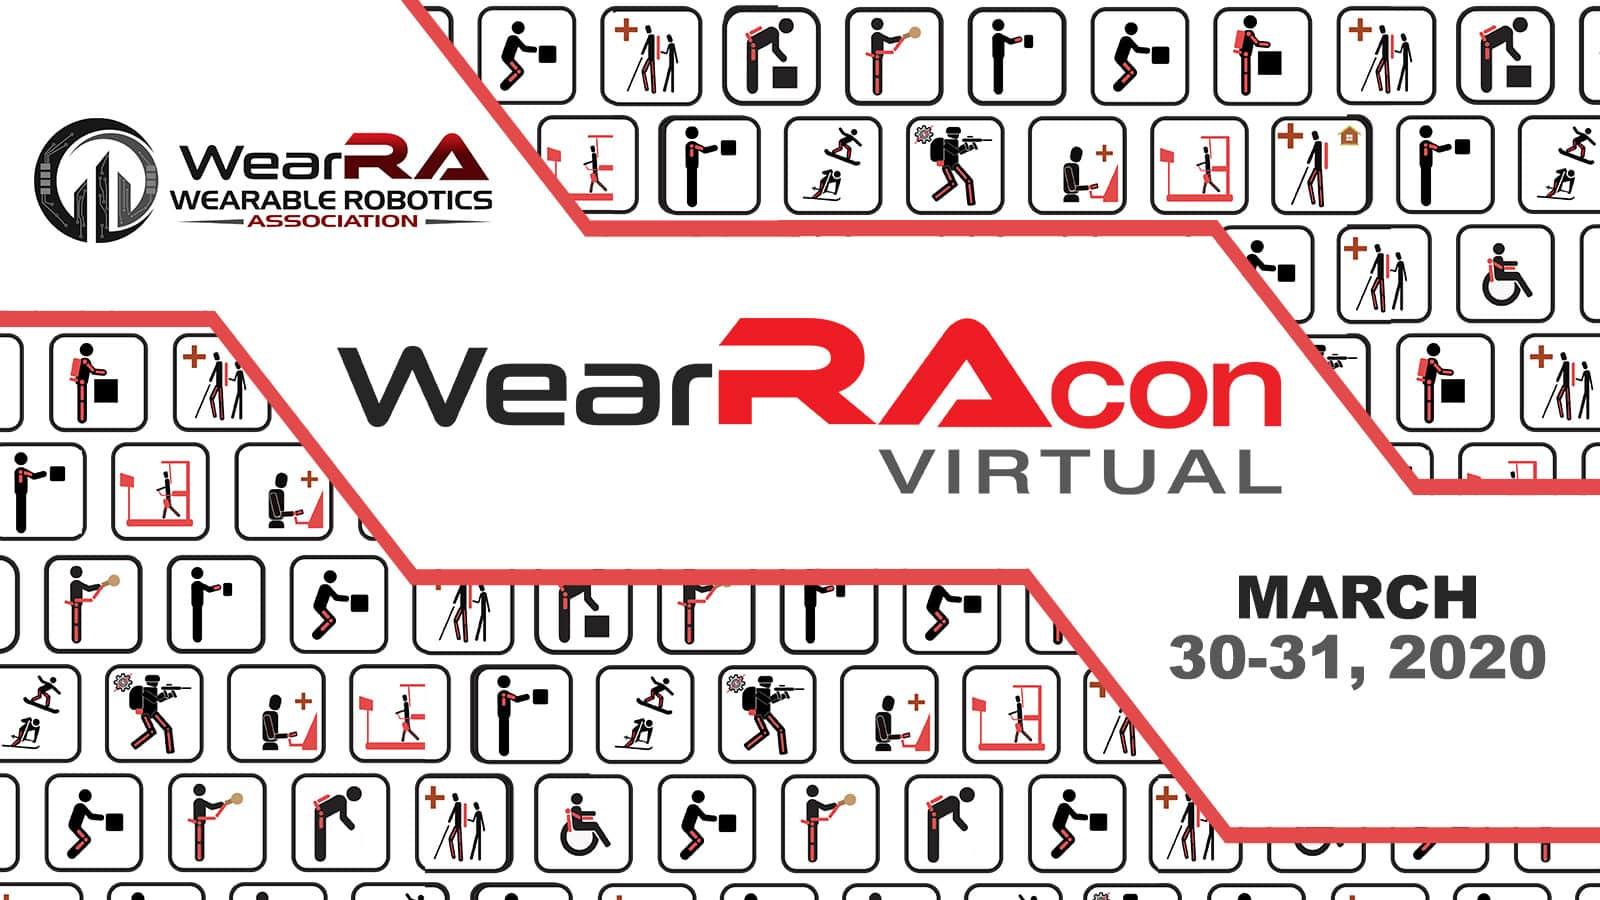 WearRAcon Virtual